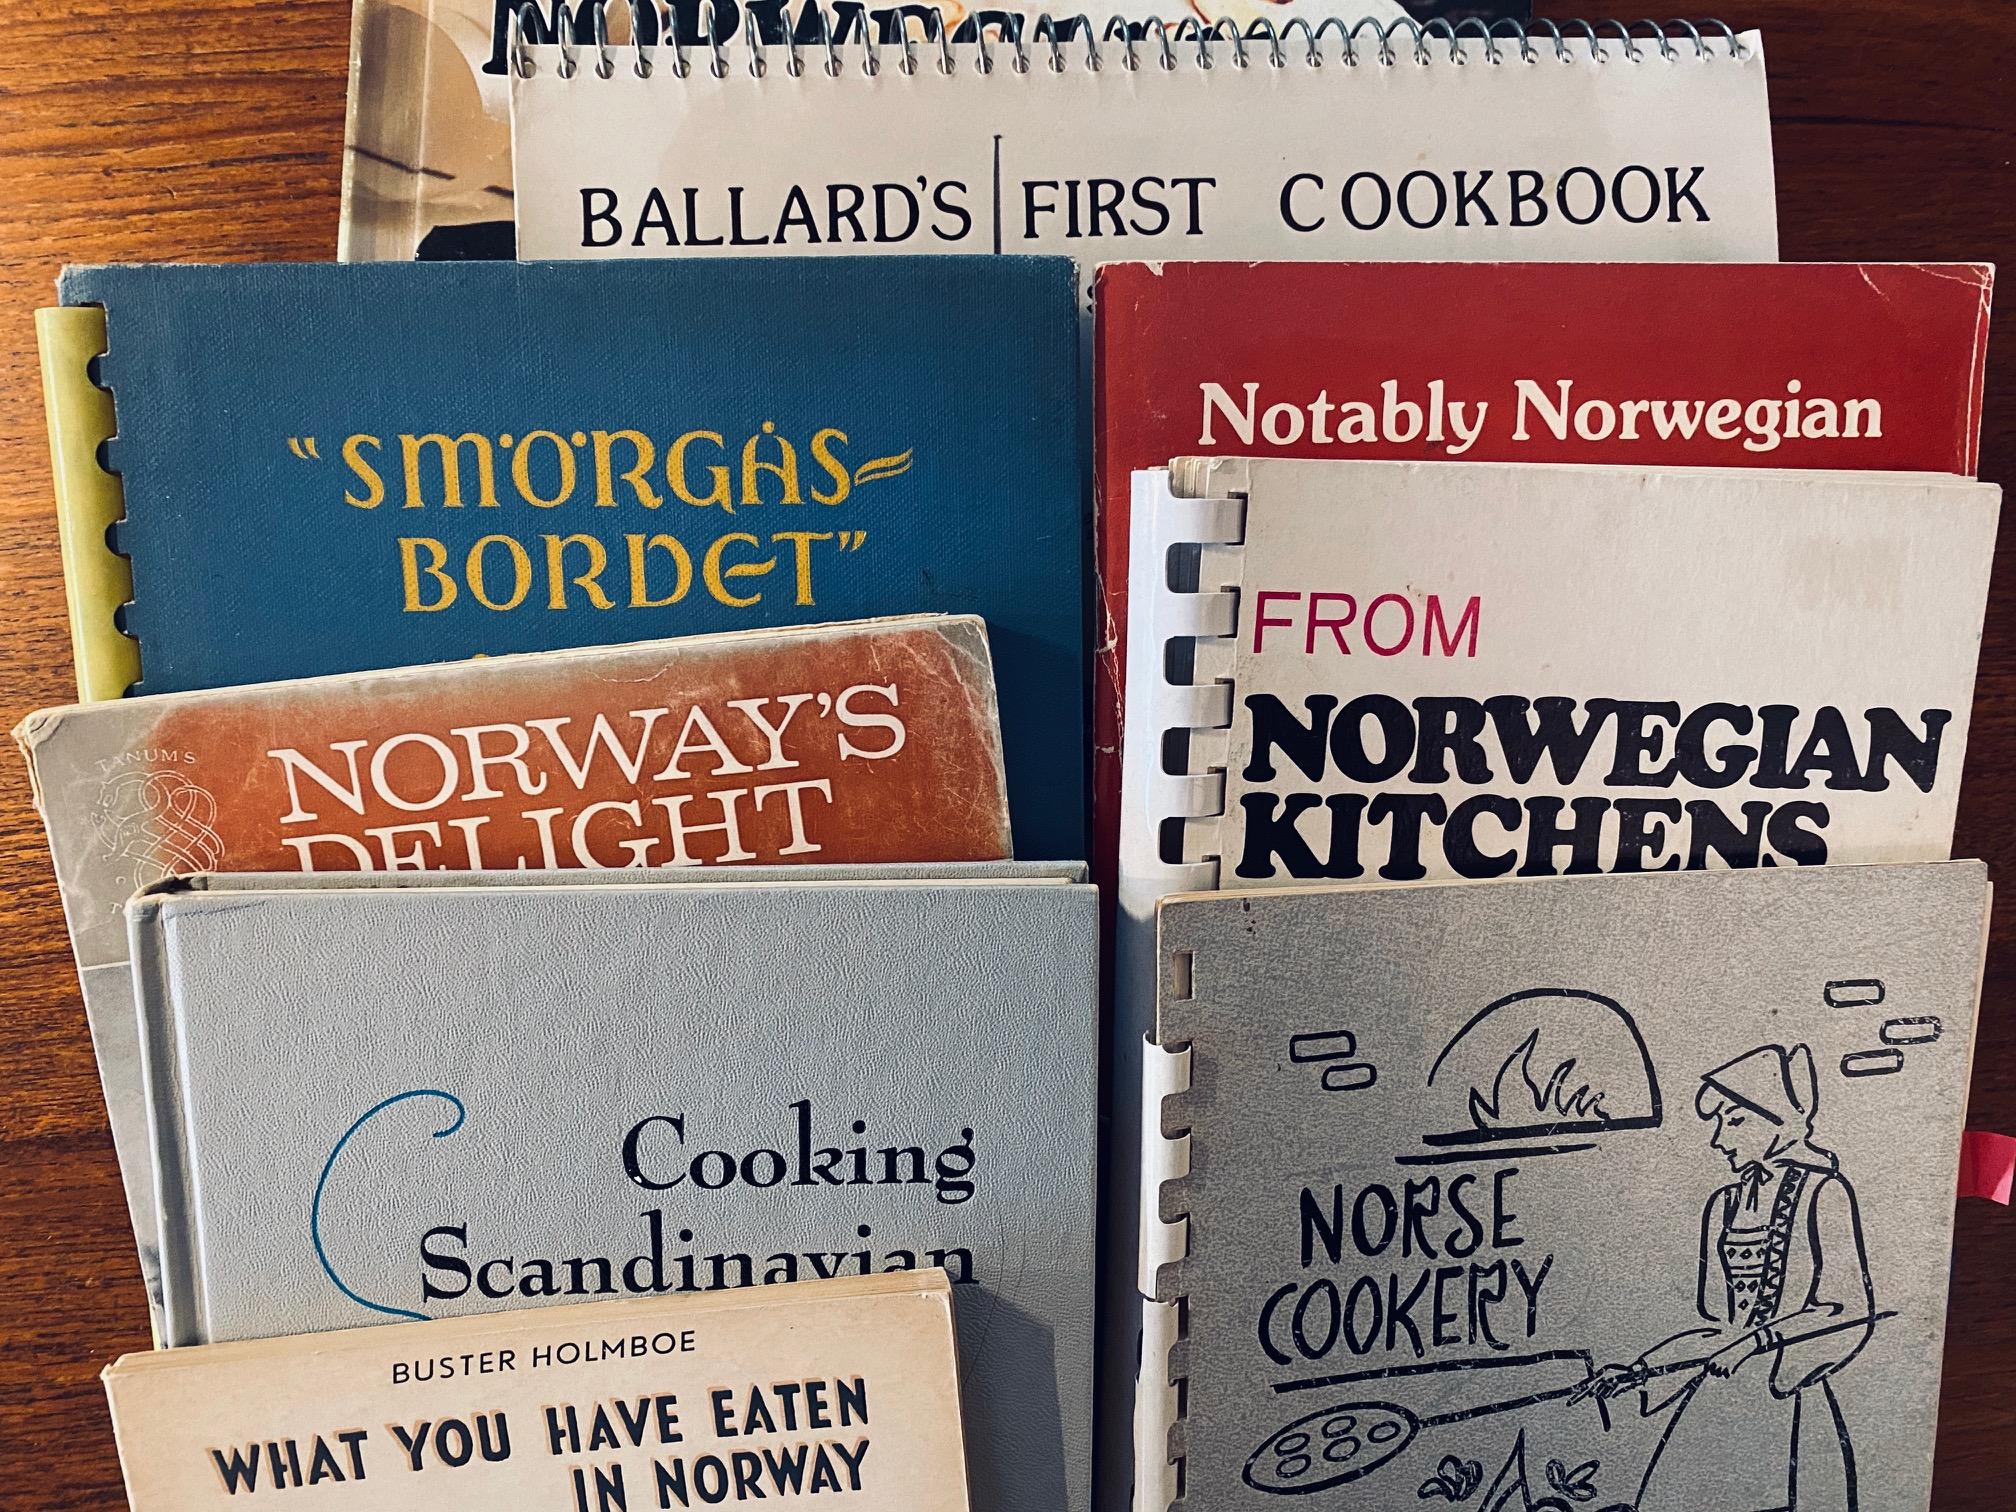 1000 books: all those Scandinavian cookbooks!